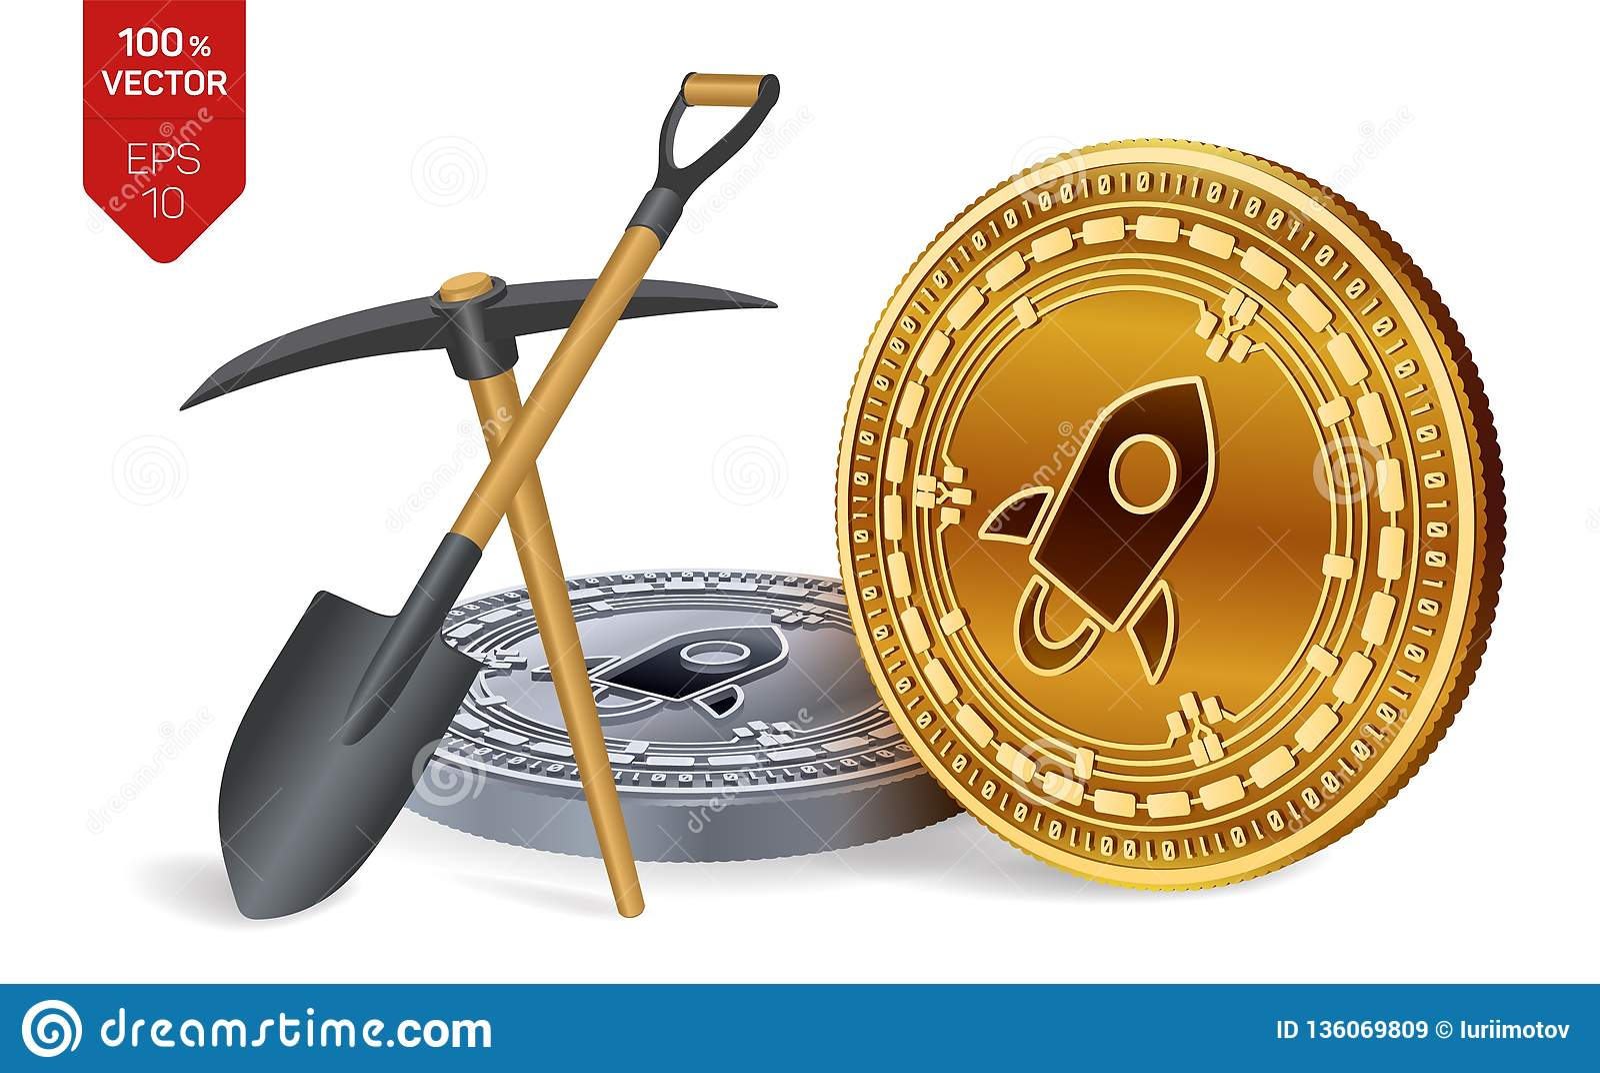 stellar mining cryptocurrency